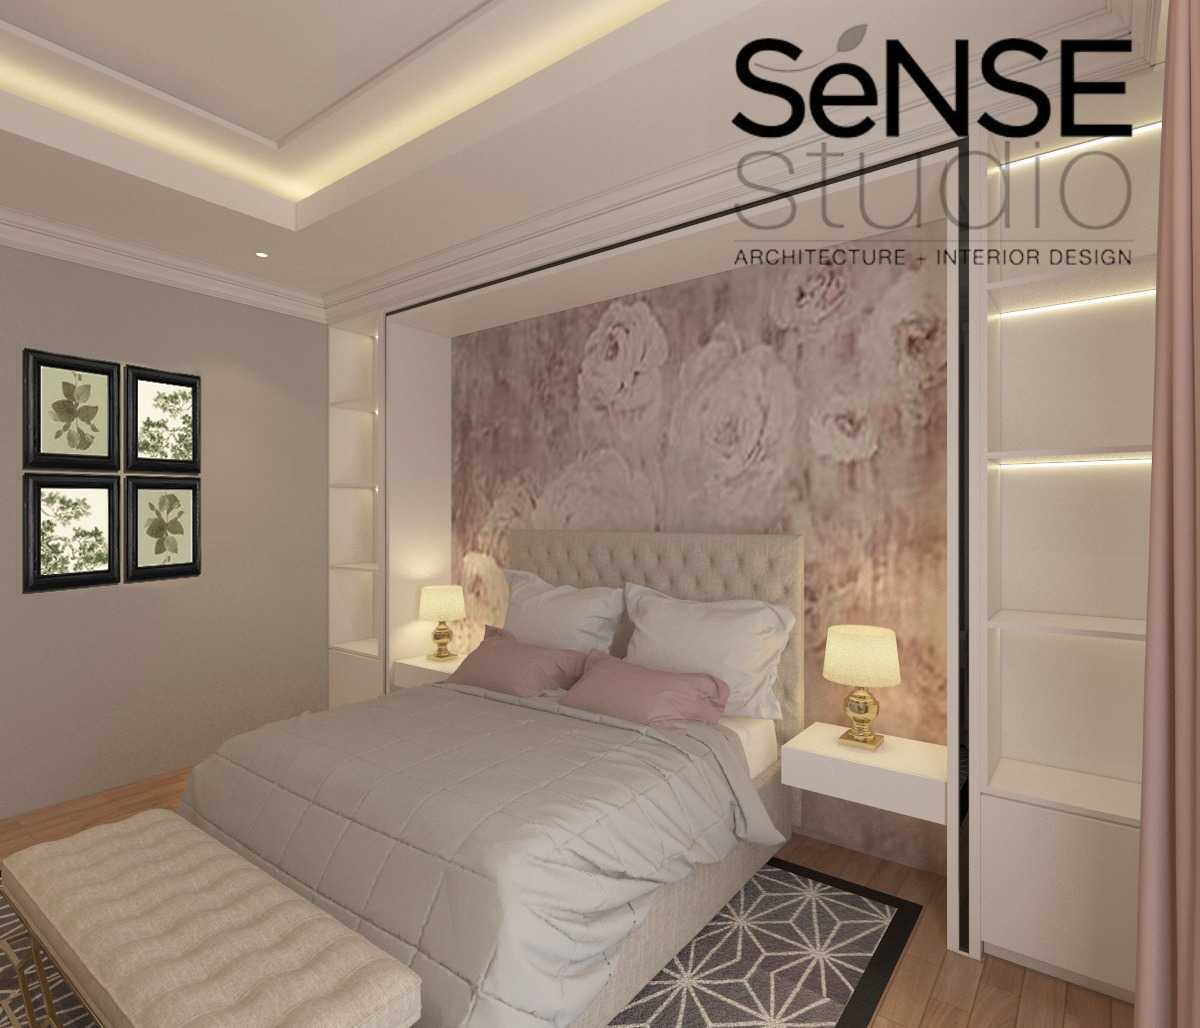 Sense Isle Studio Residence Surabaya Surabaya, Kota Sby, Jawa Timur, Indonesia Surabaya, Kota Sby, Jawa Timur, Indonesia Sense-Studio-Residence-Surabaya  80441